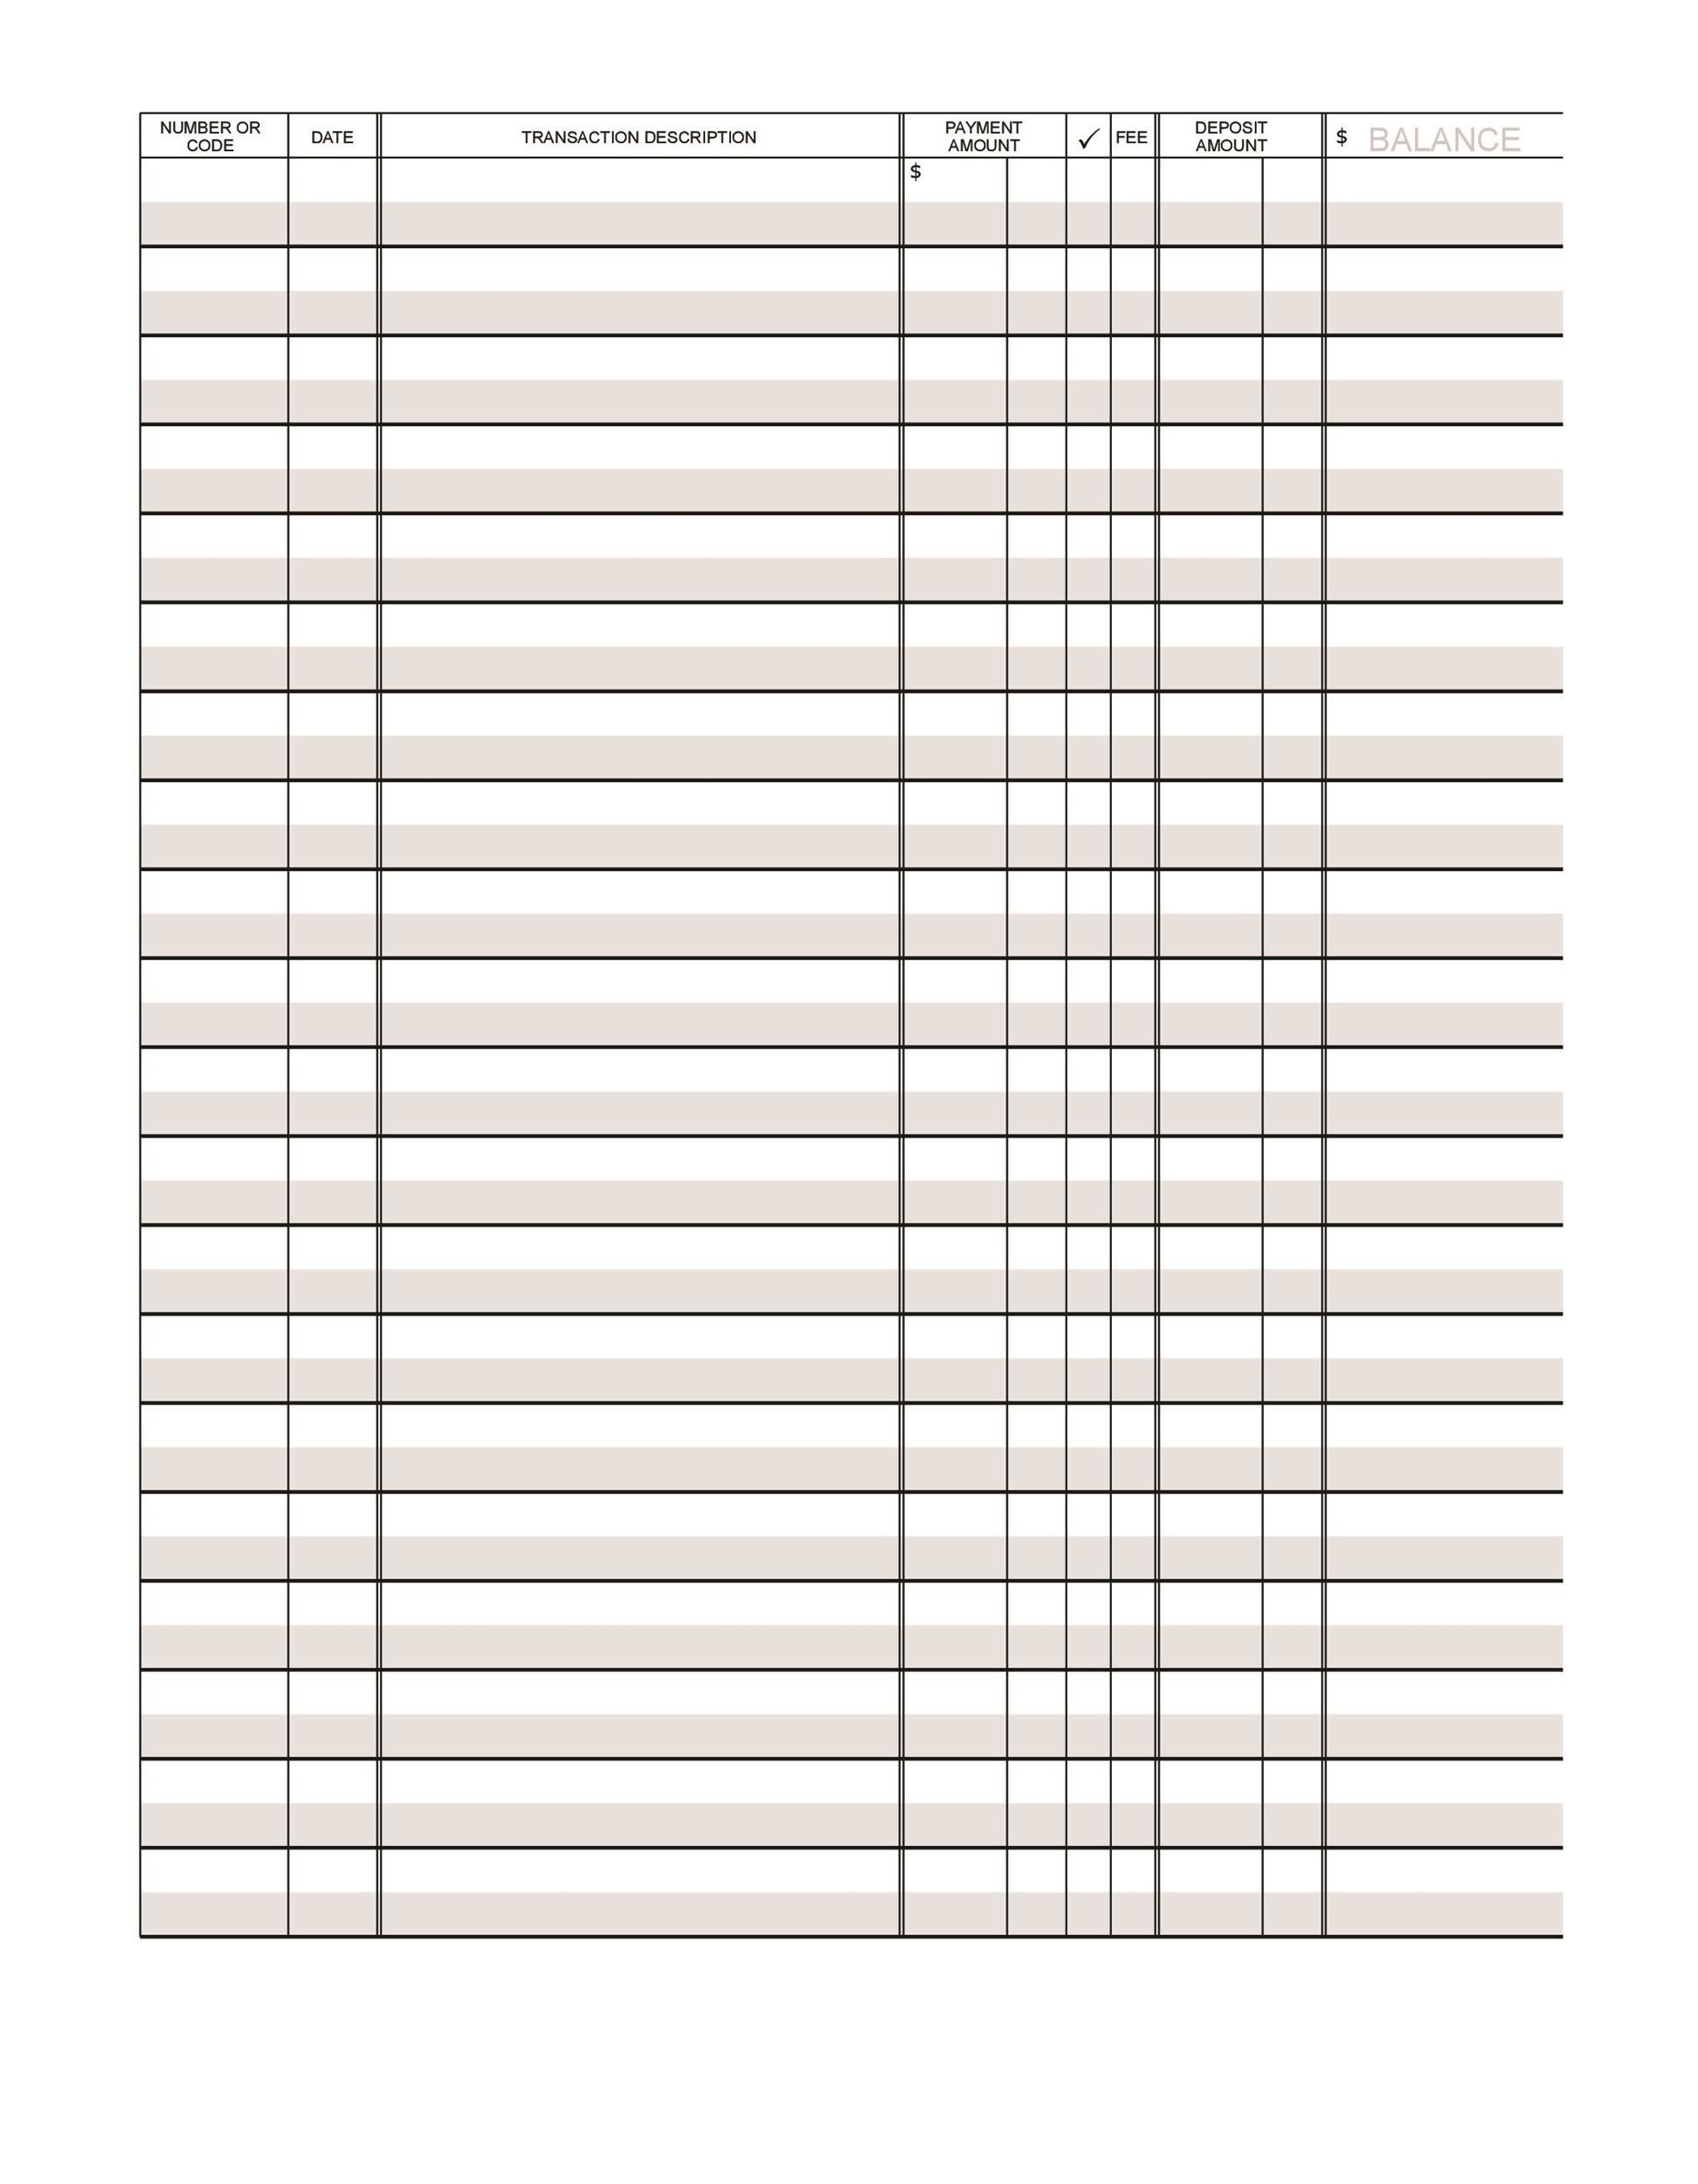 004 Fascinating Checkbook Register Template Excel 2013 Highest Quality Full